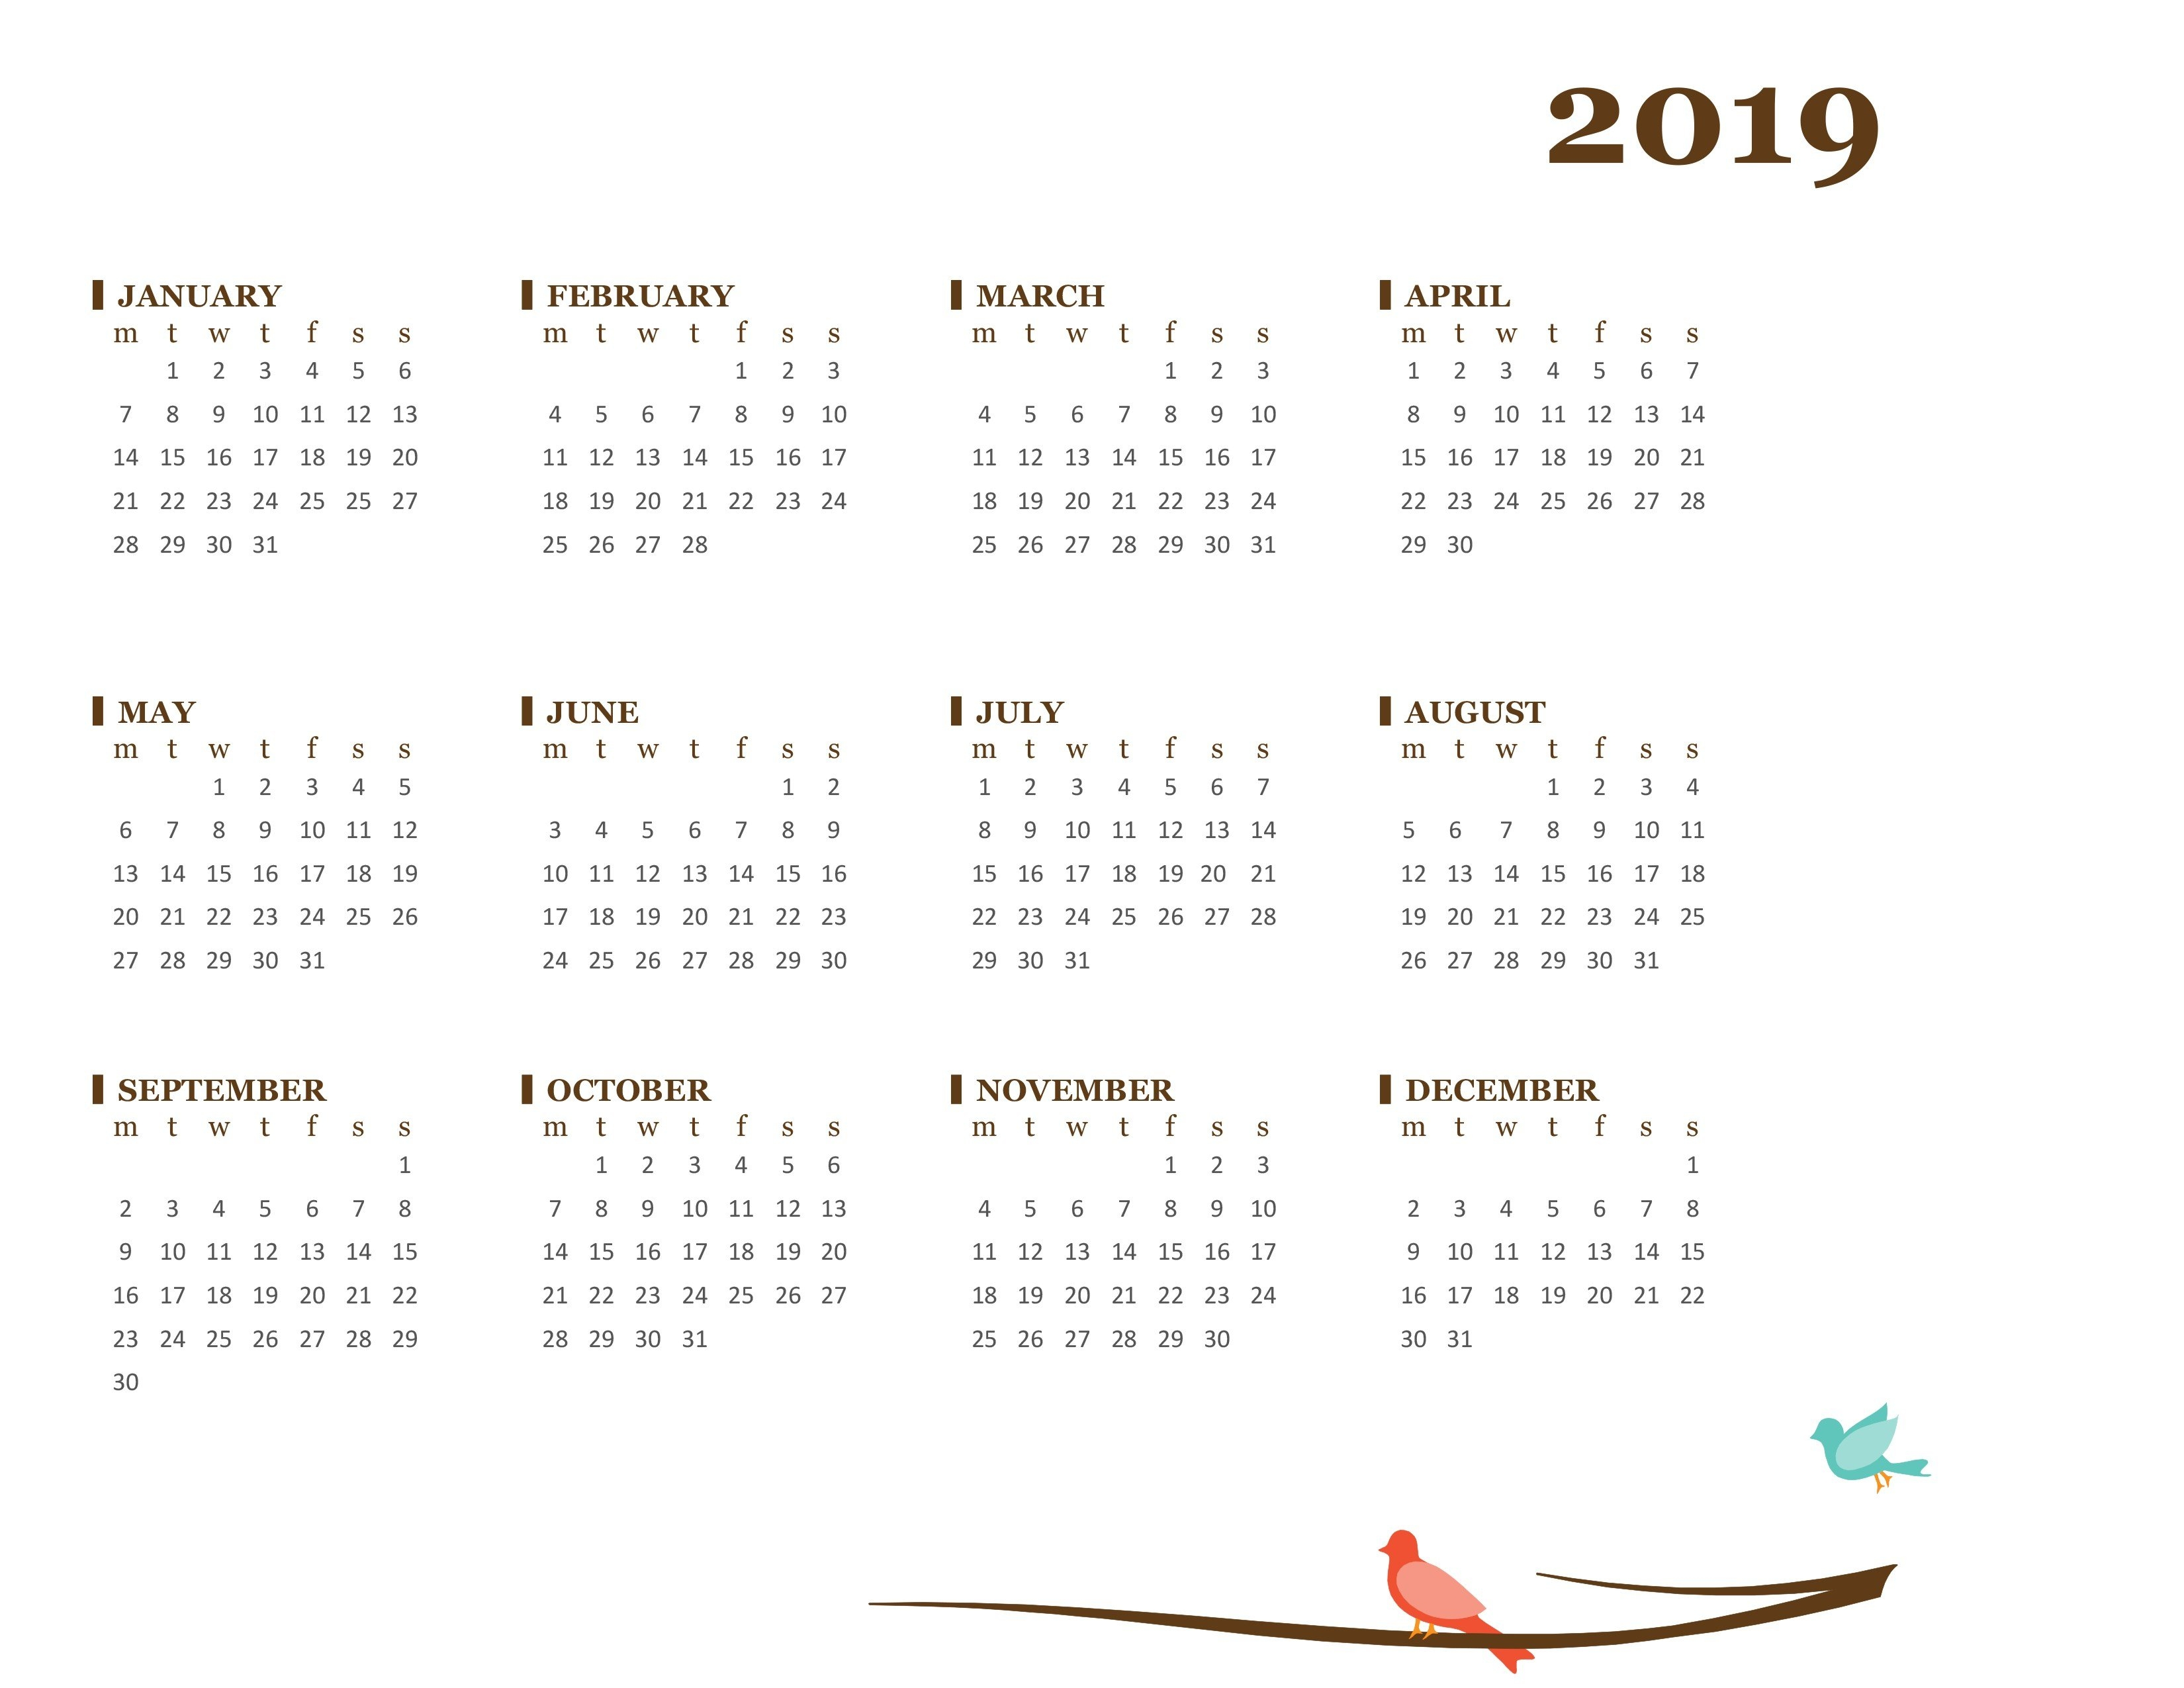 2019 Yearly Calendar (Mon Sun) Picture Of A 2019 Calendar